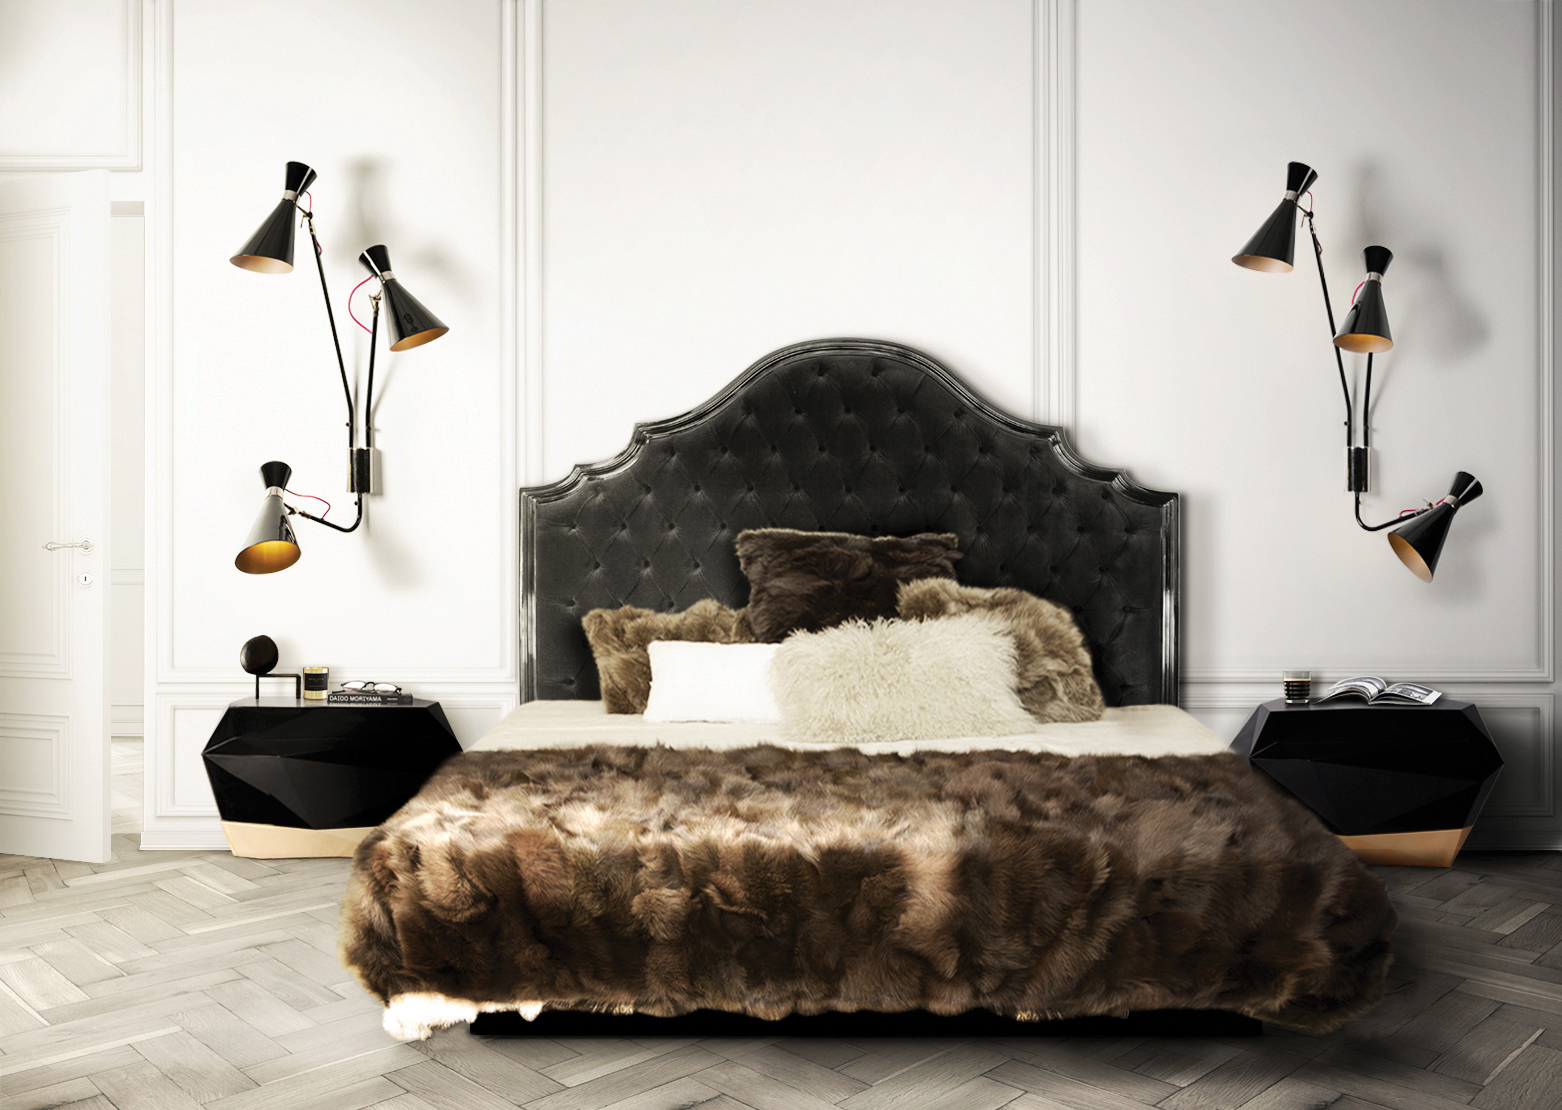 Summer Trends 8 Mid-Century Modern Lamps for Bedroom Design 1